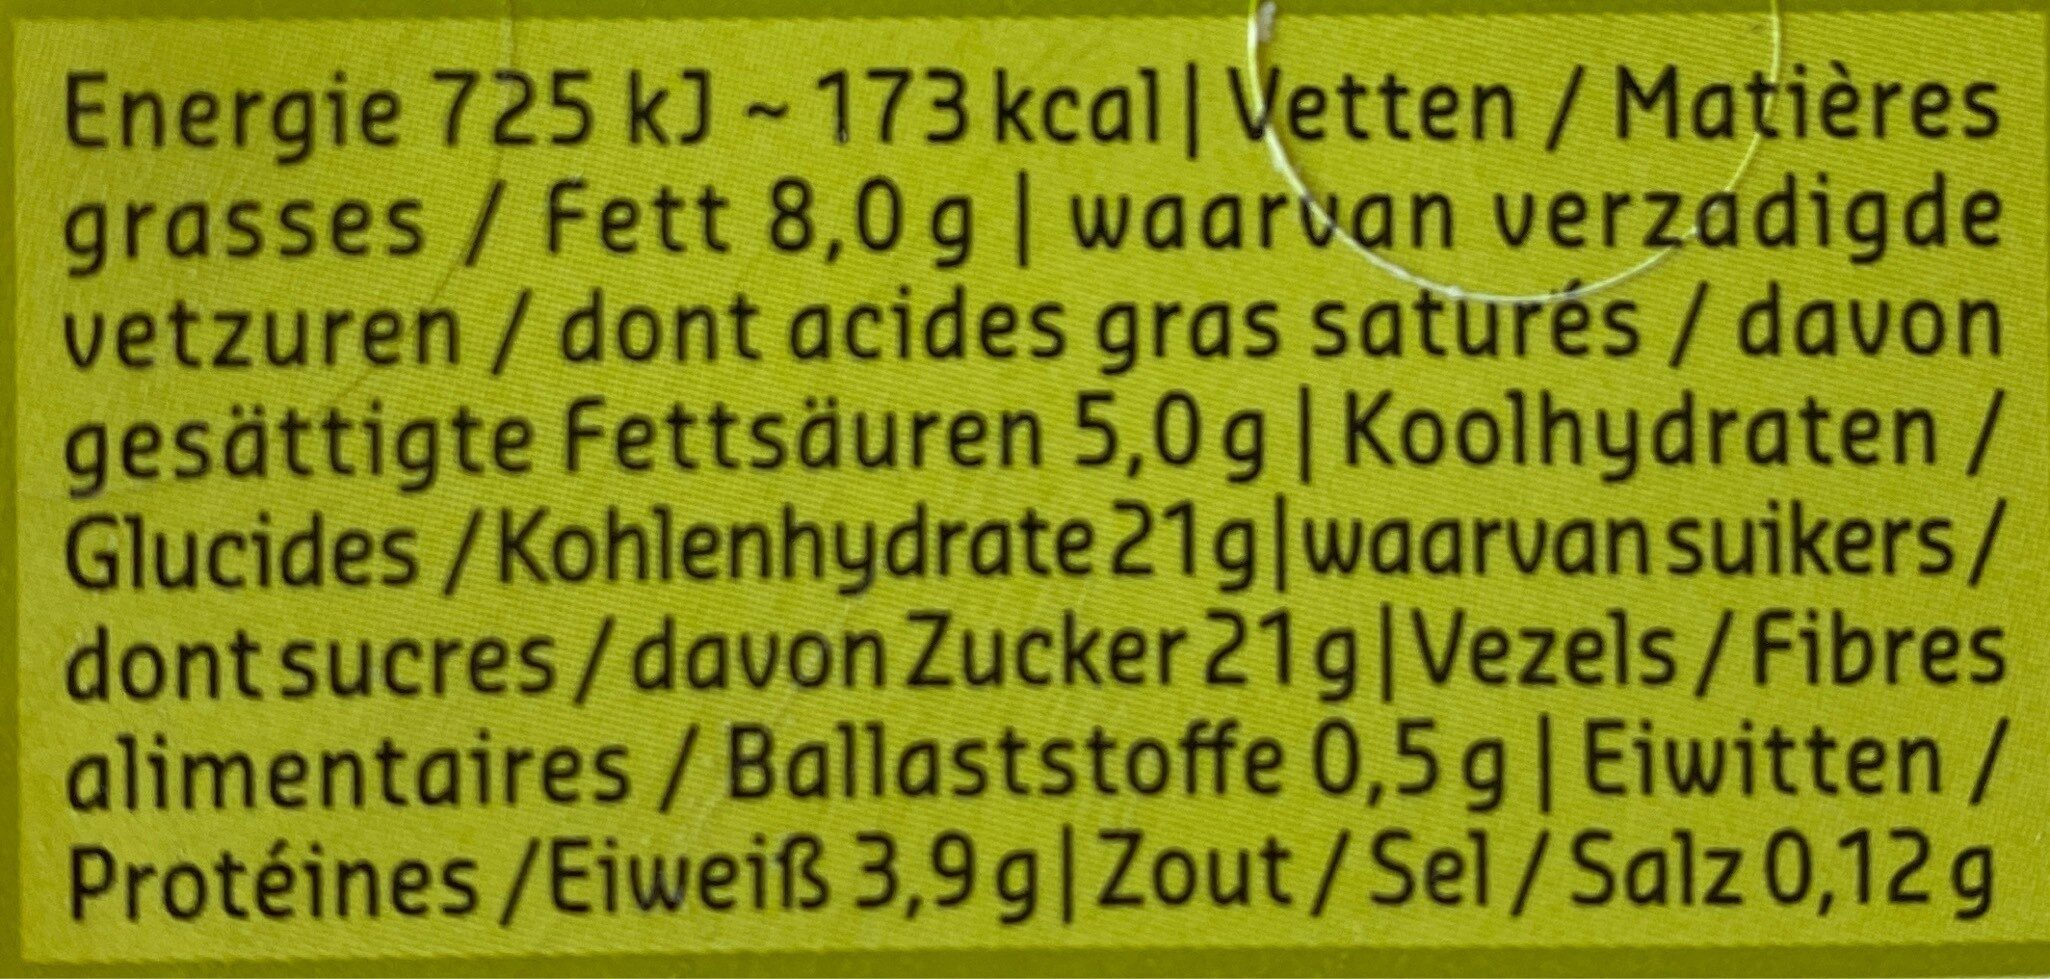 Creme glacee vanille bio - Voedingswaarden - fr